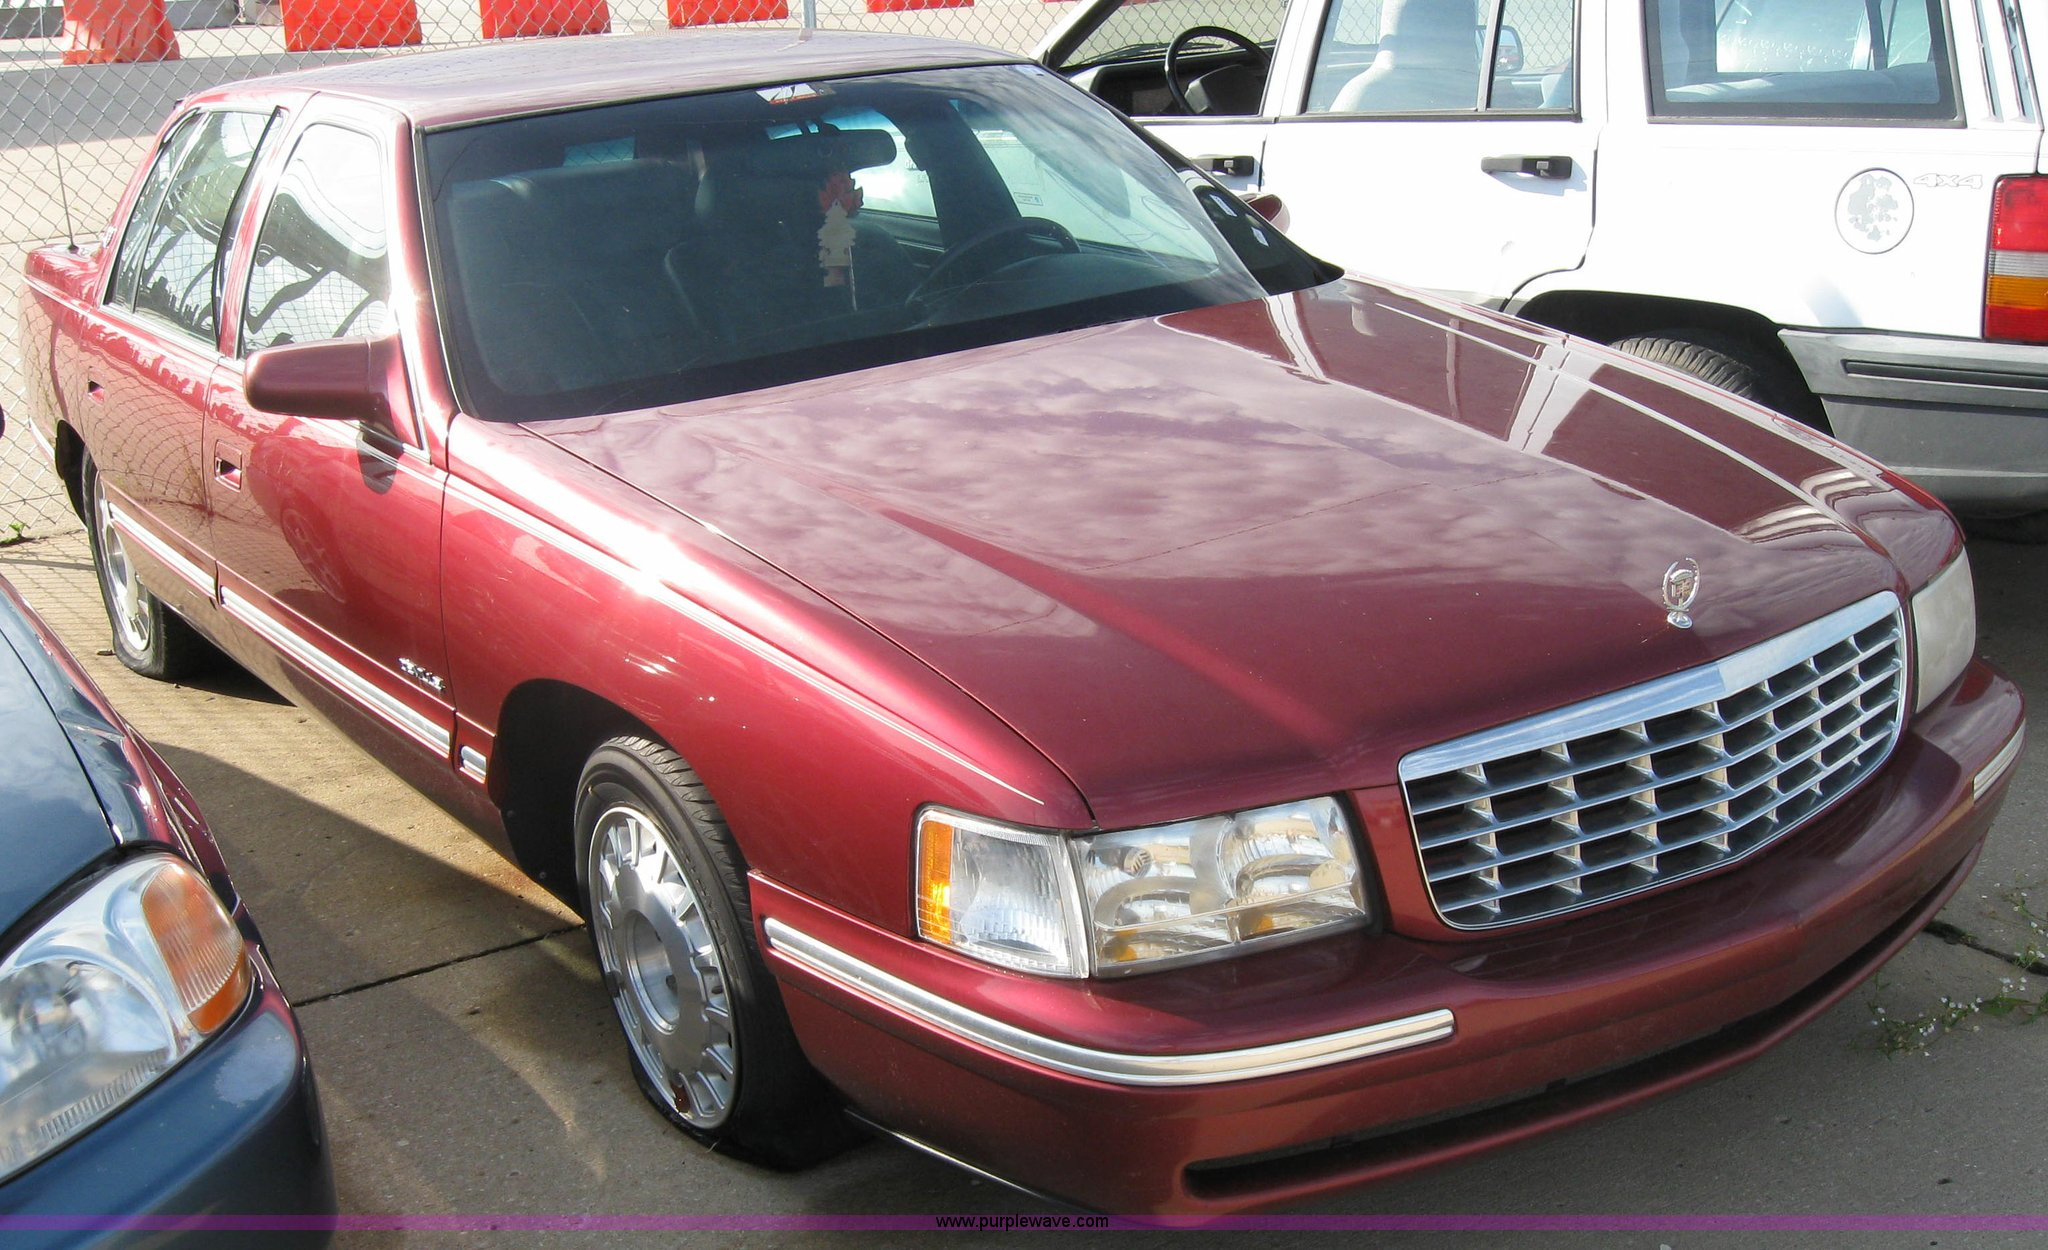 1998 Cadillac Deville Seville Fuse Box Location Item 2210 Sold August 11 Ft Rile Rh Purplewave Com F